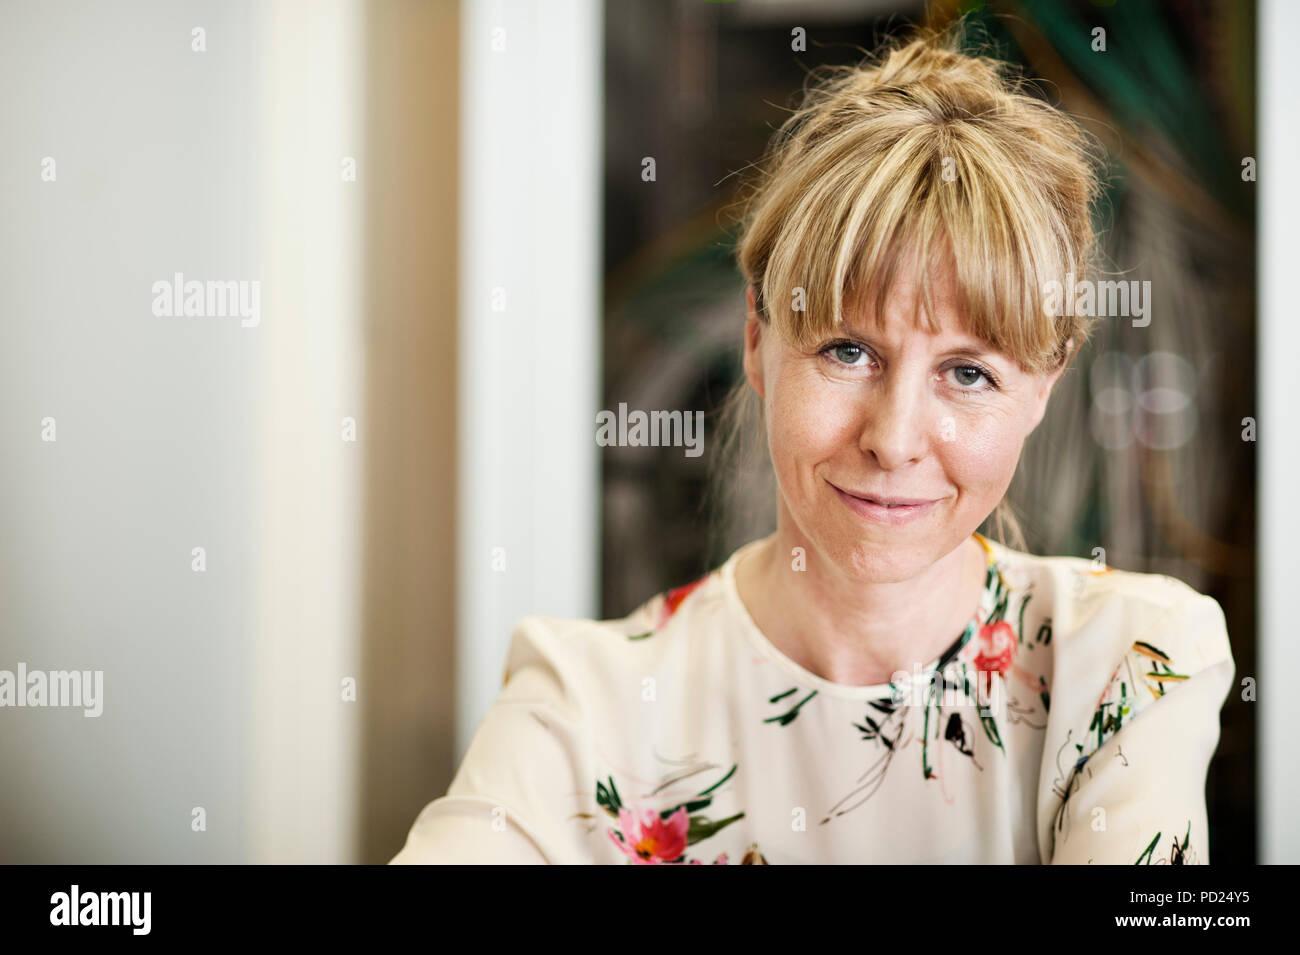 Eva Derous, associate professor in the Department of Personnel Management, Work and Organizational Psychology at Ghent University (Belgium, 25/05/2017 - Stock Image